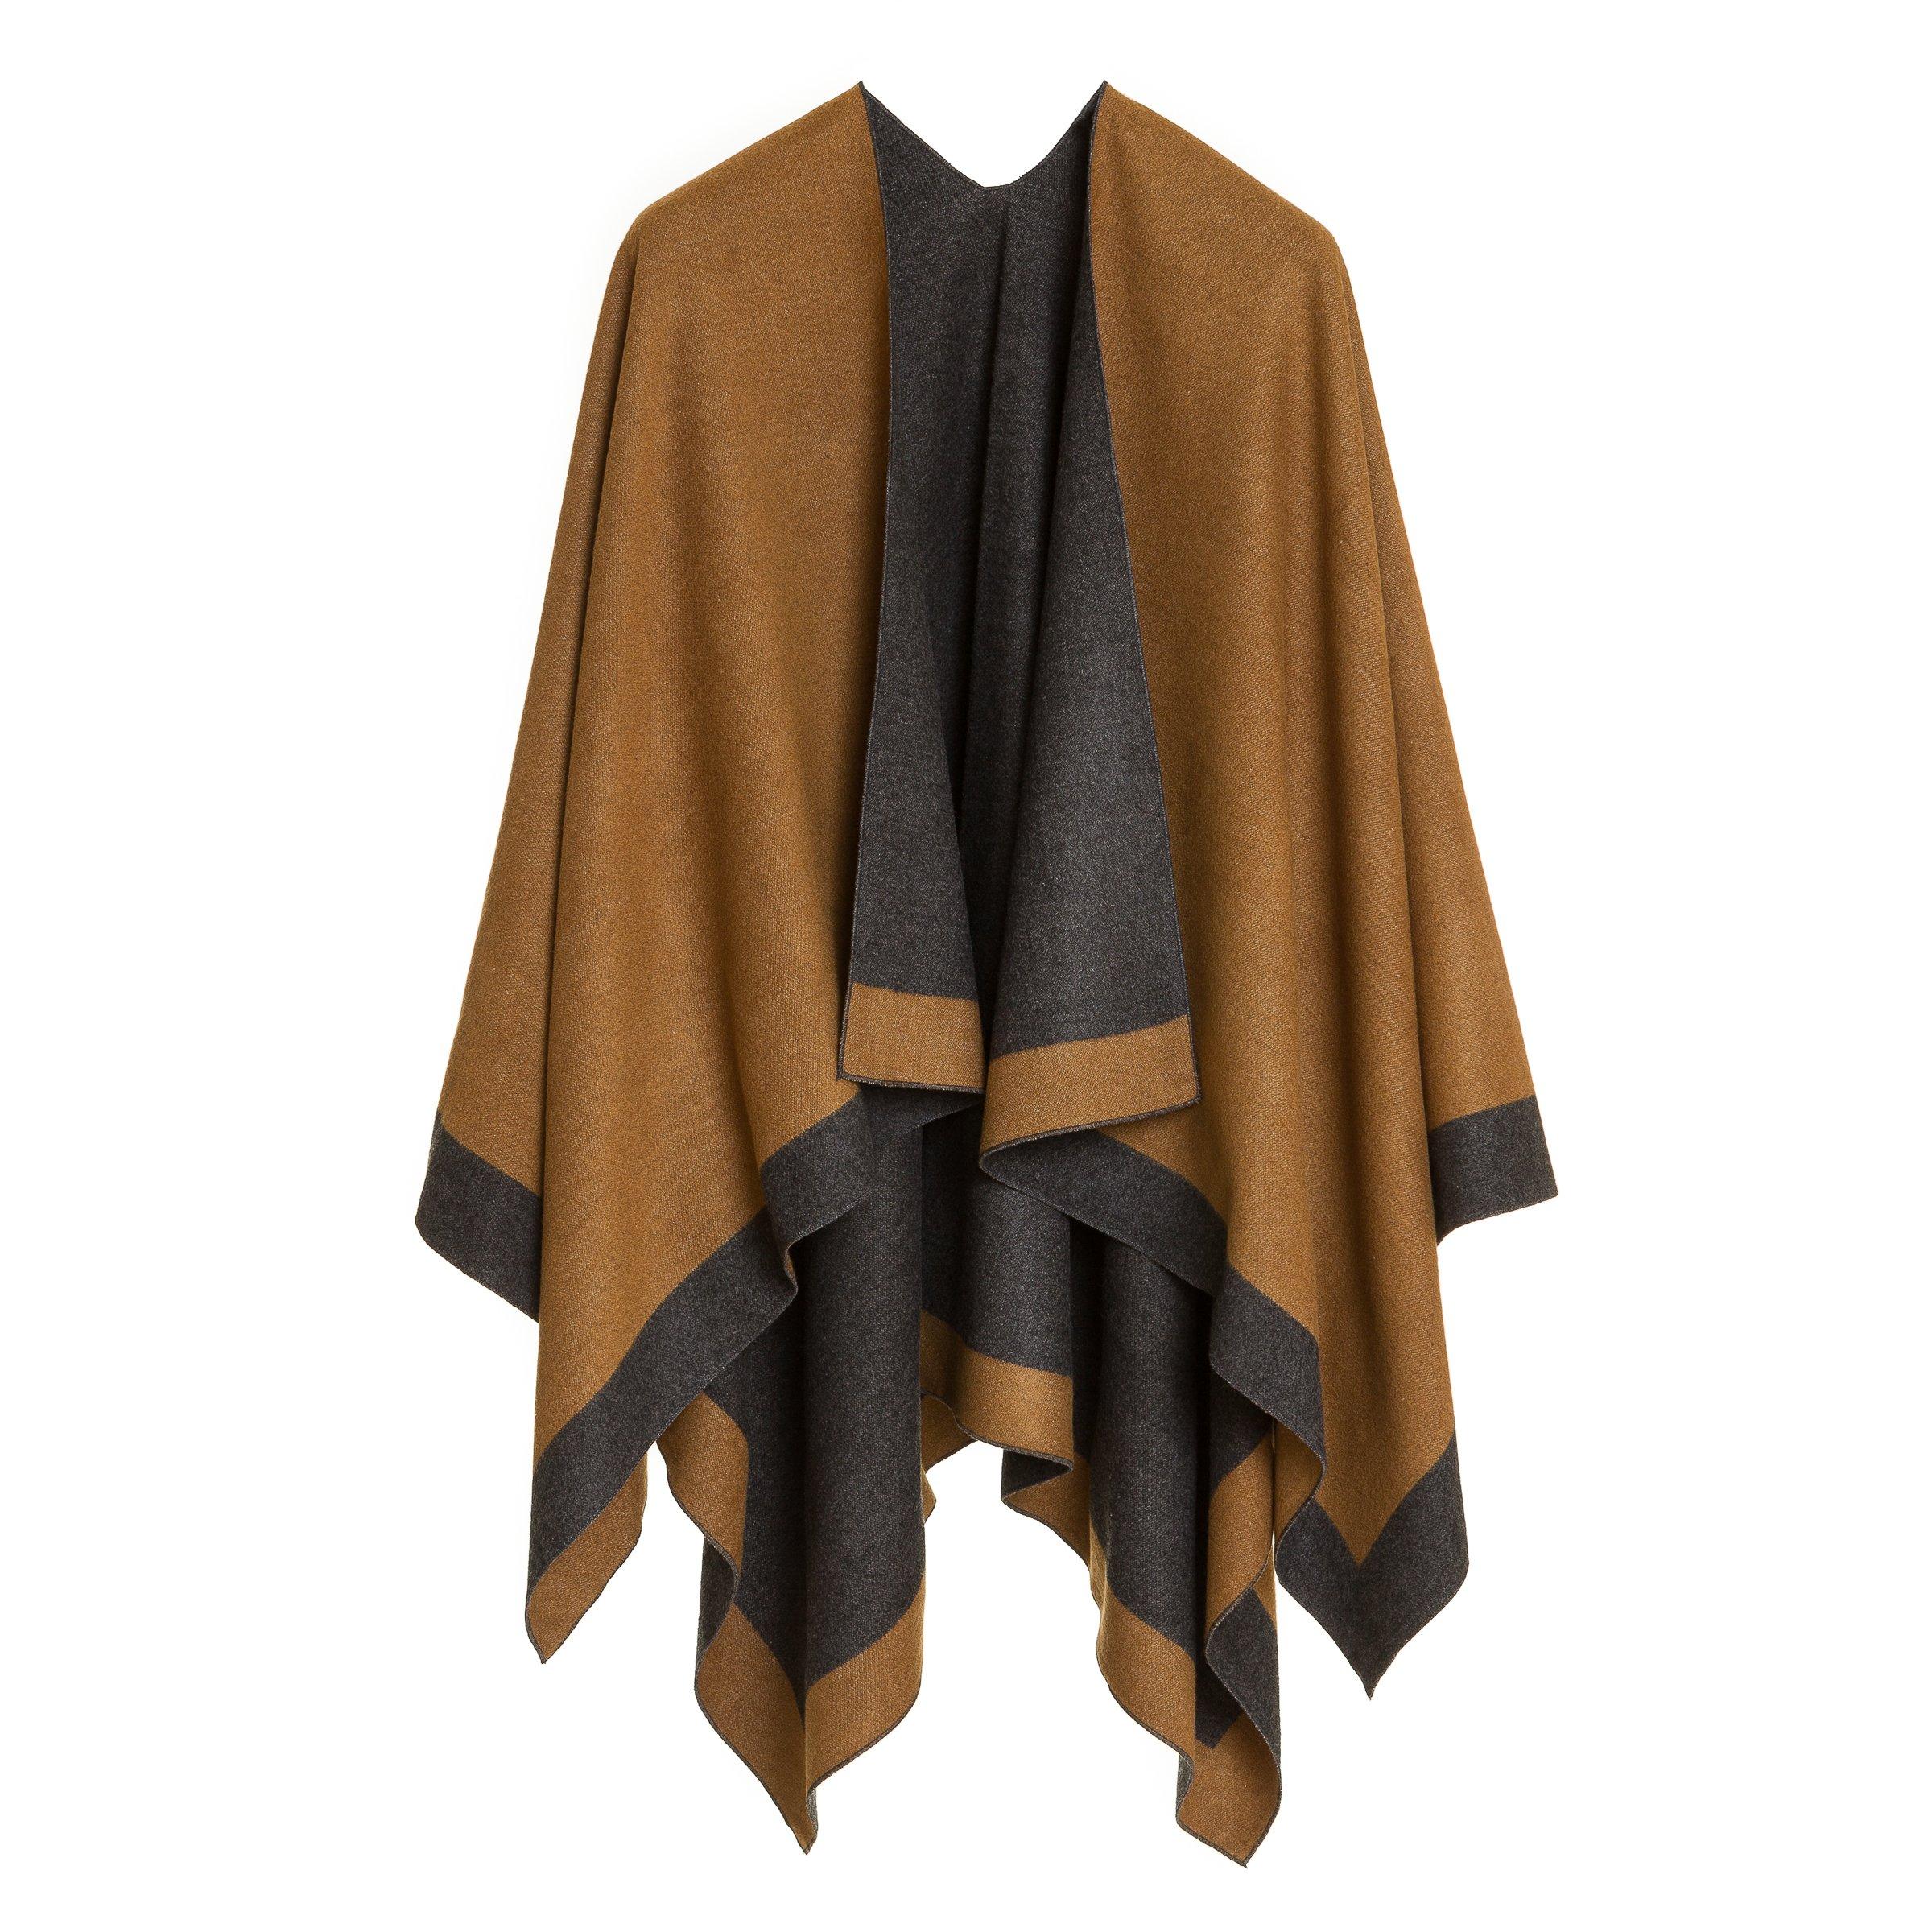 Cardigan Poncho Cape: Women Elegant Gray Cardigan Shawl Wrap Sweater Coat for Winter (Dark Beige Gray)